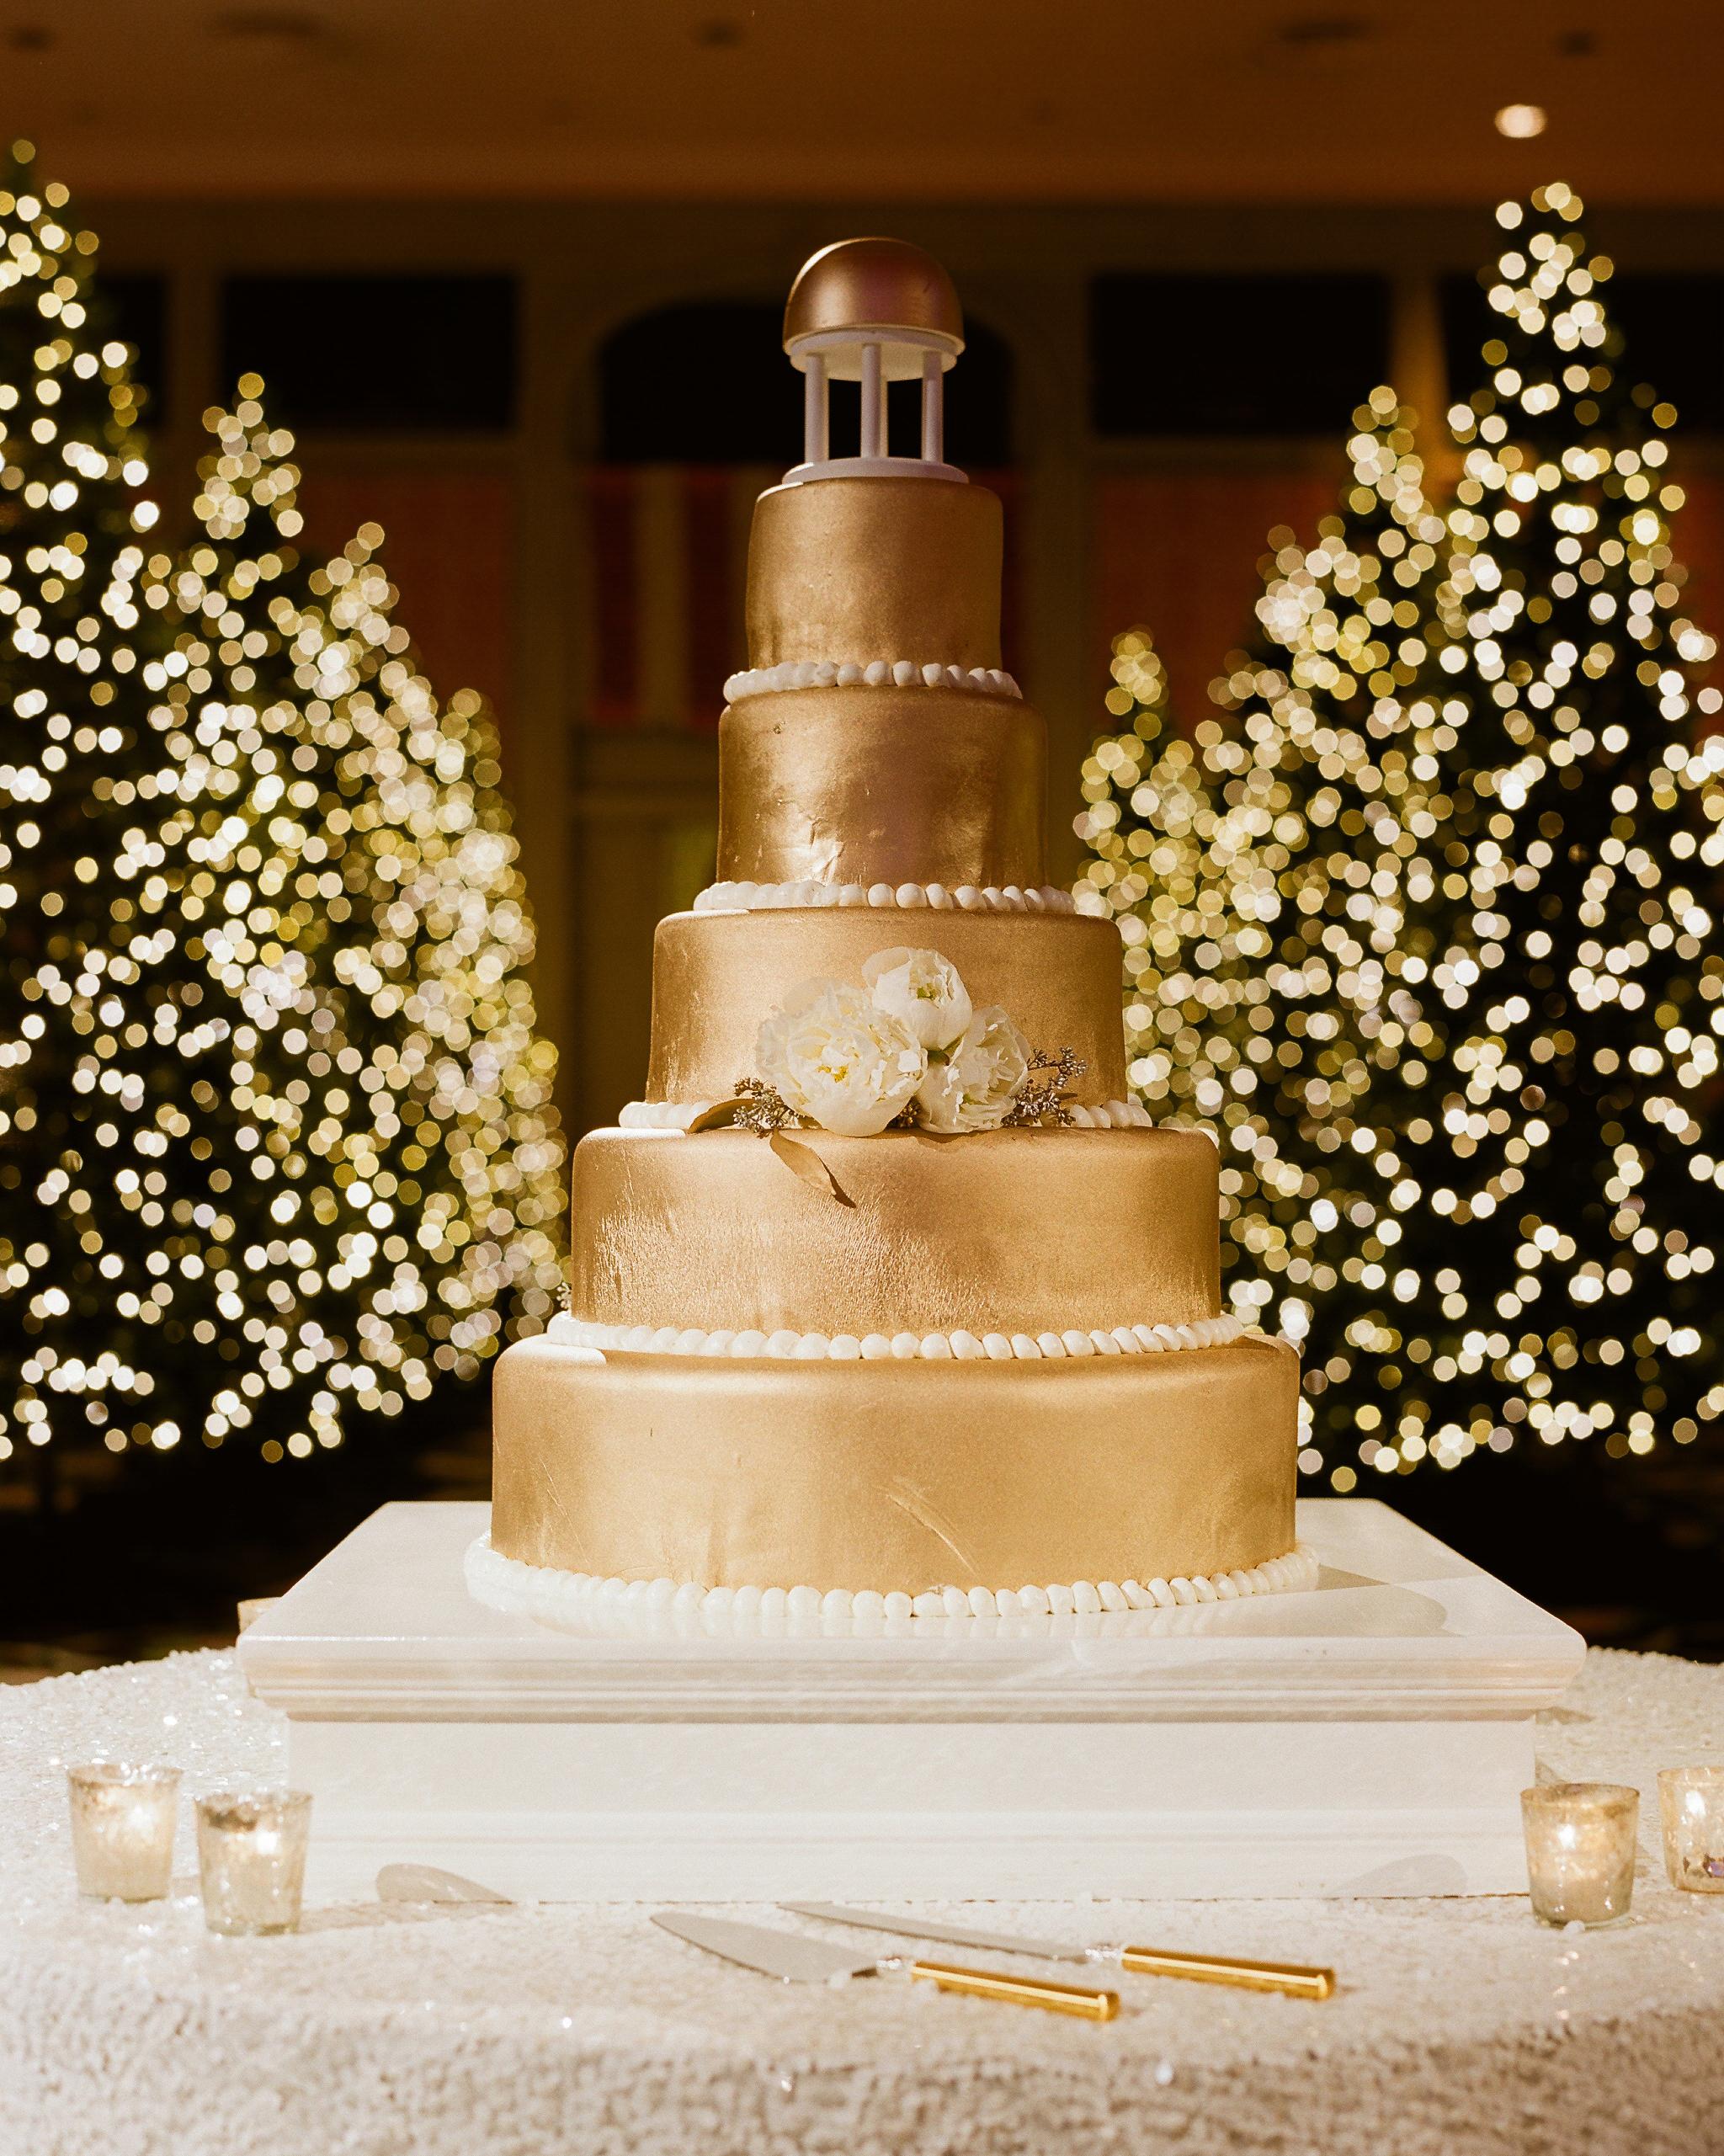 paige-michael-wedding-cake-0947-s112431-1215.jpg